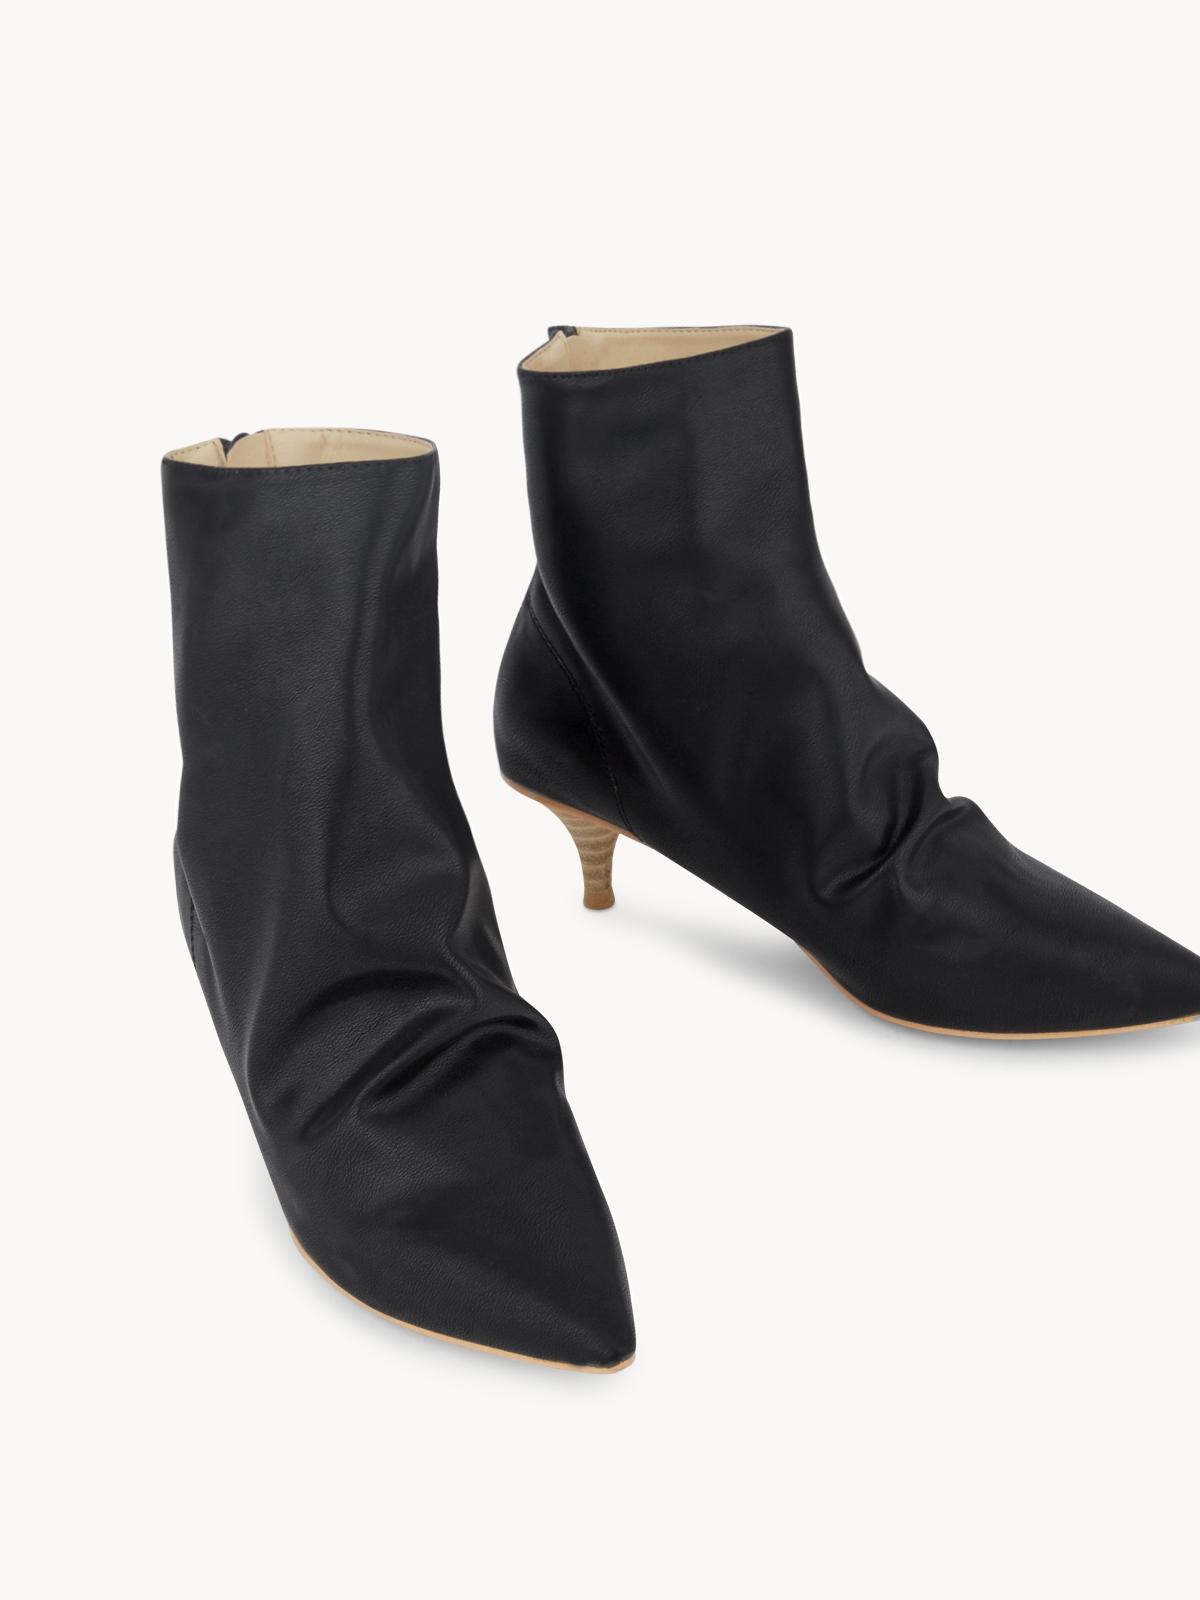 Starkela Western Knee High Boots Black